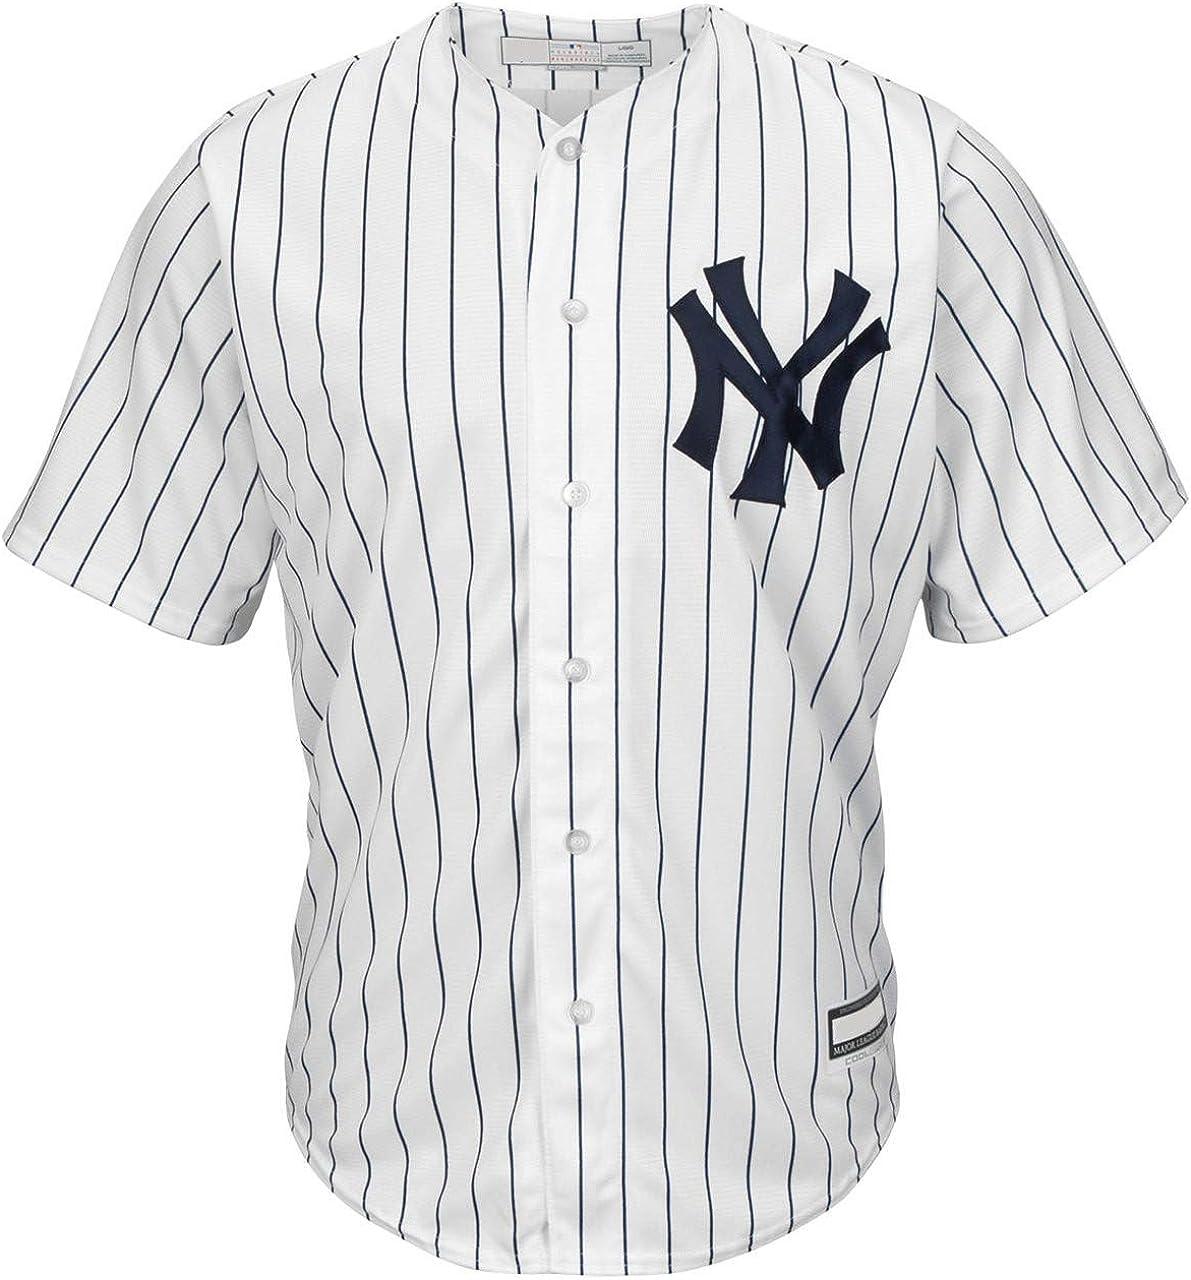 Babe Ruth New York Yankees MLB Boys Youth 8-20 Player Jersey